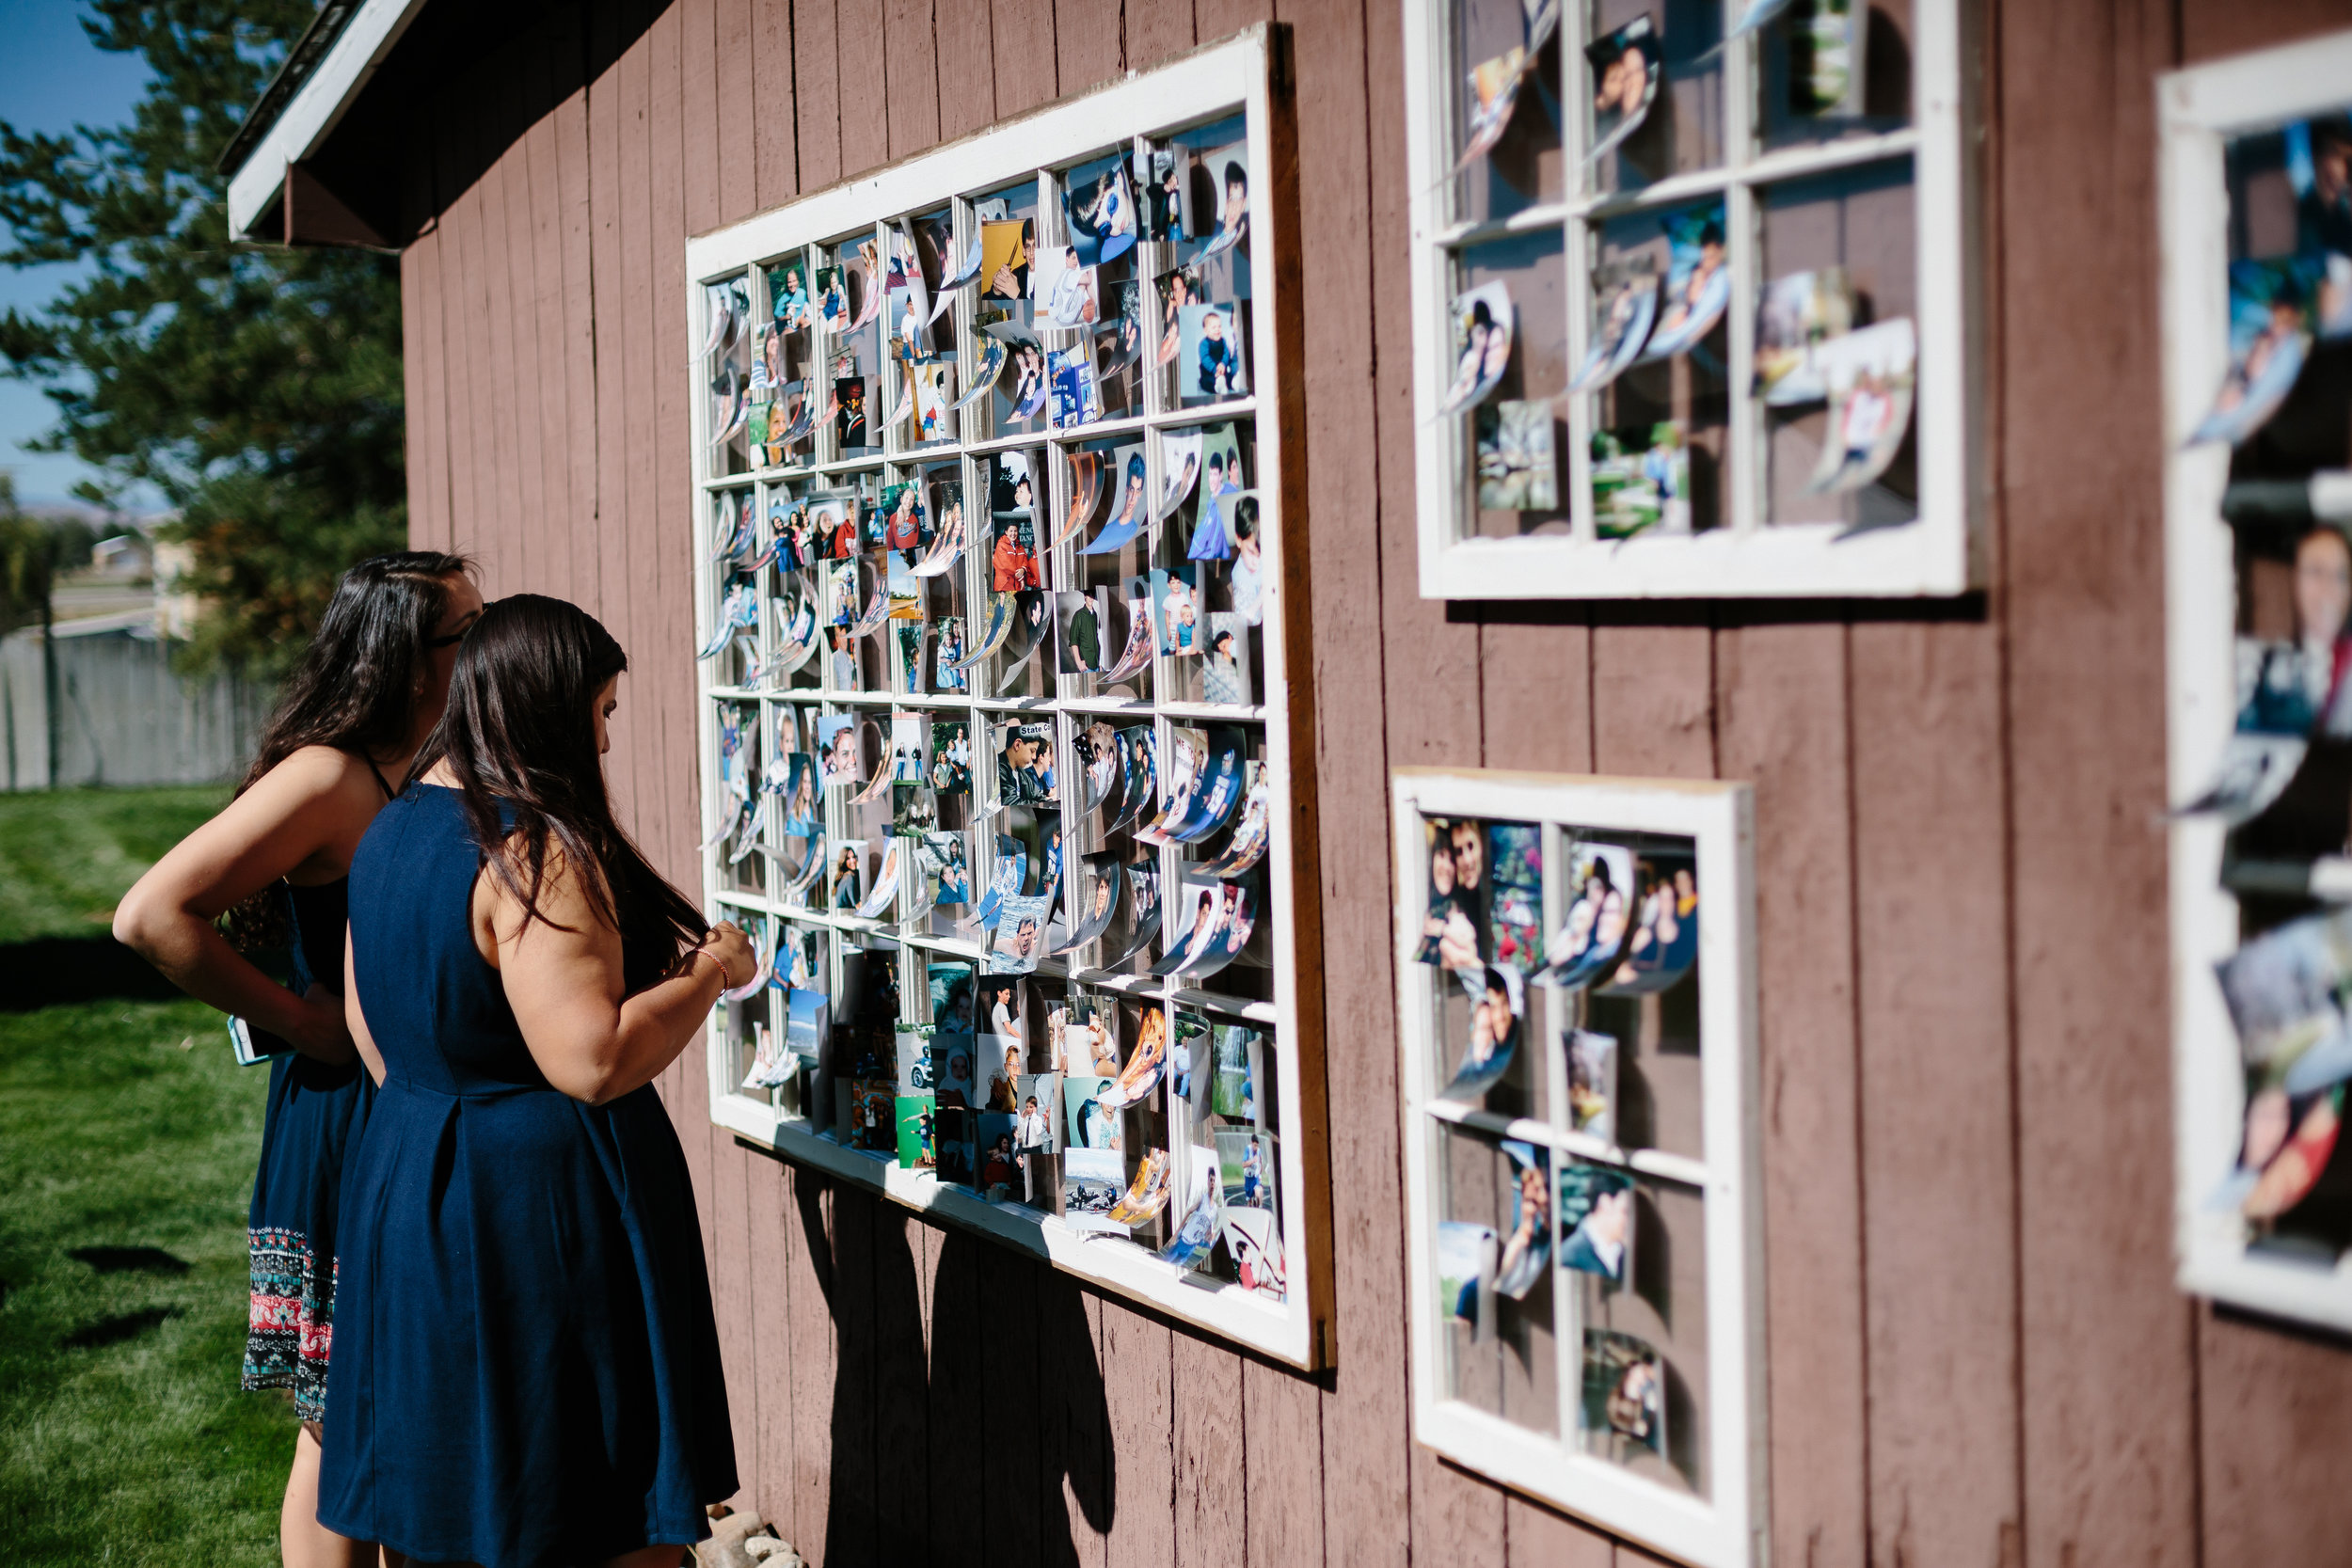 Jordan & Shantel Married - Idaho - Corrie Mick Photography-249.jpg